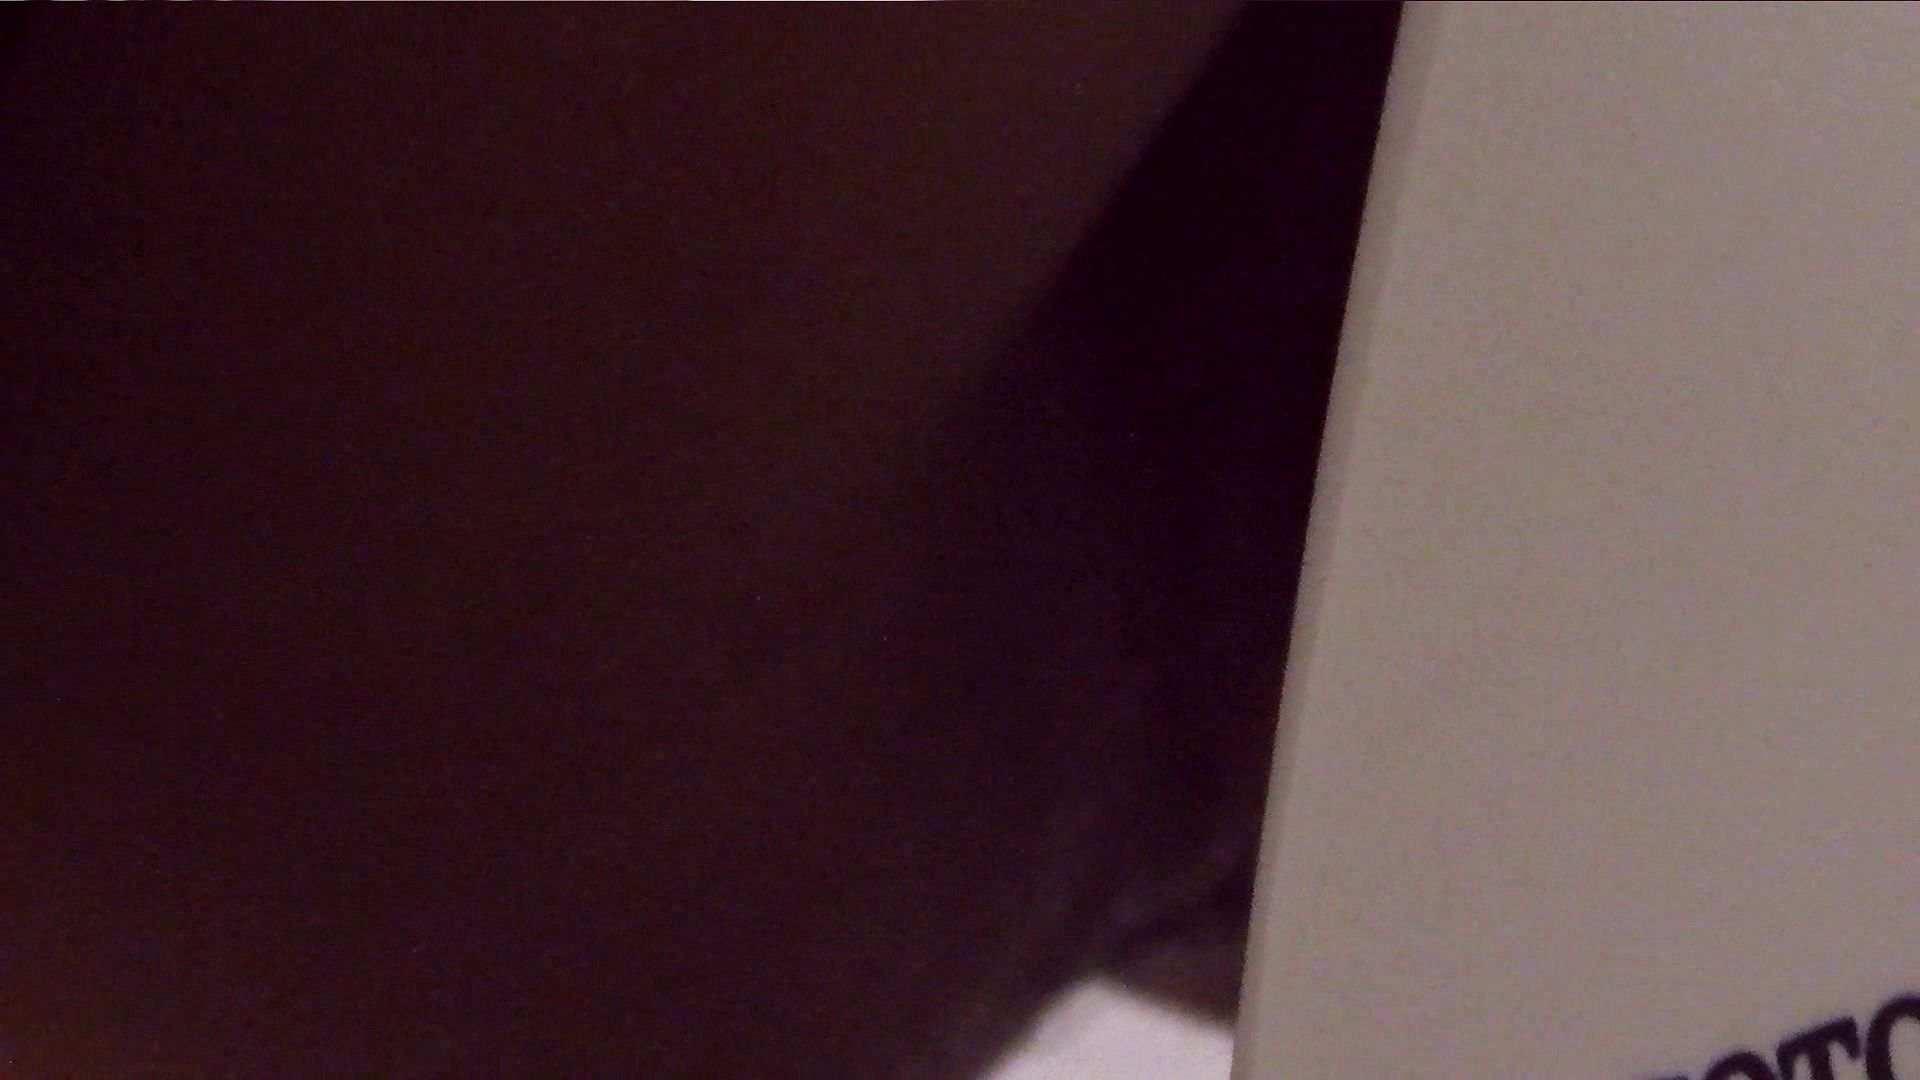 vol.17 命がけ潜伏洗面所! 張り裂けんばかりの大物 潜入 盗み撮り動画 69連発 64